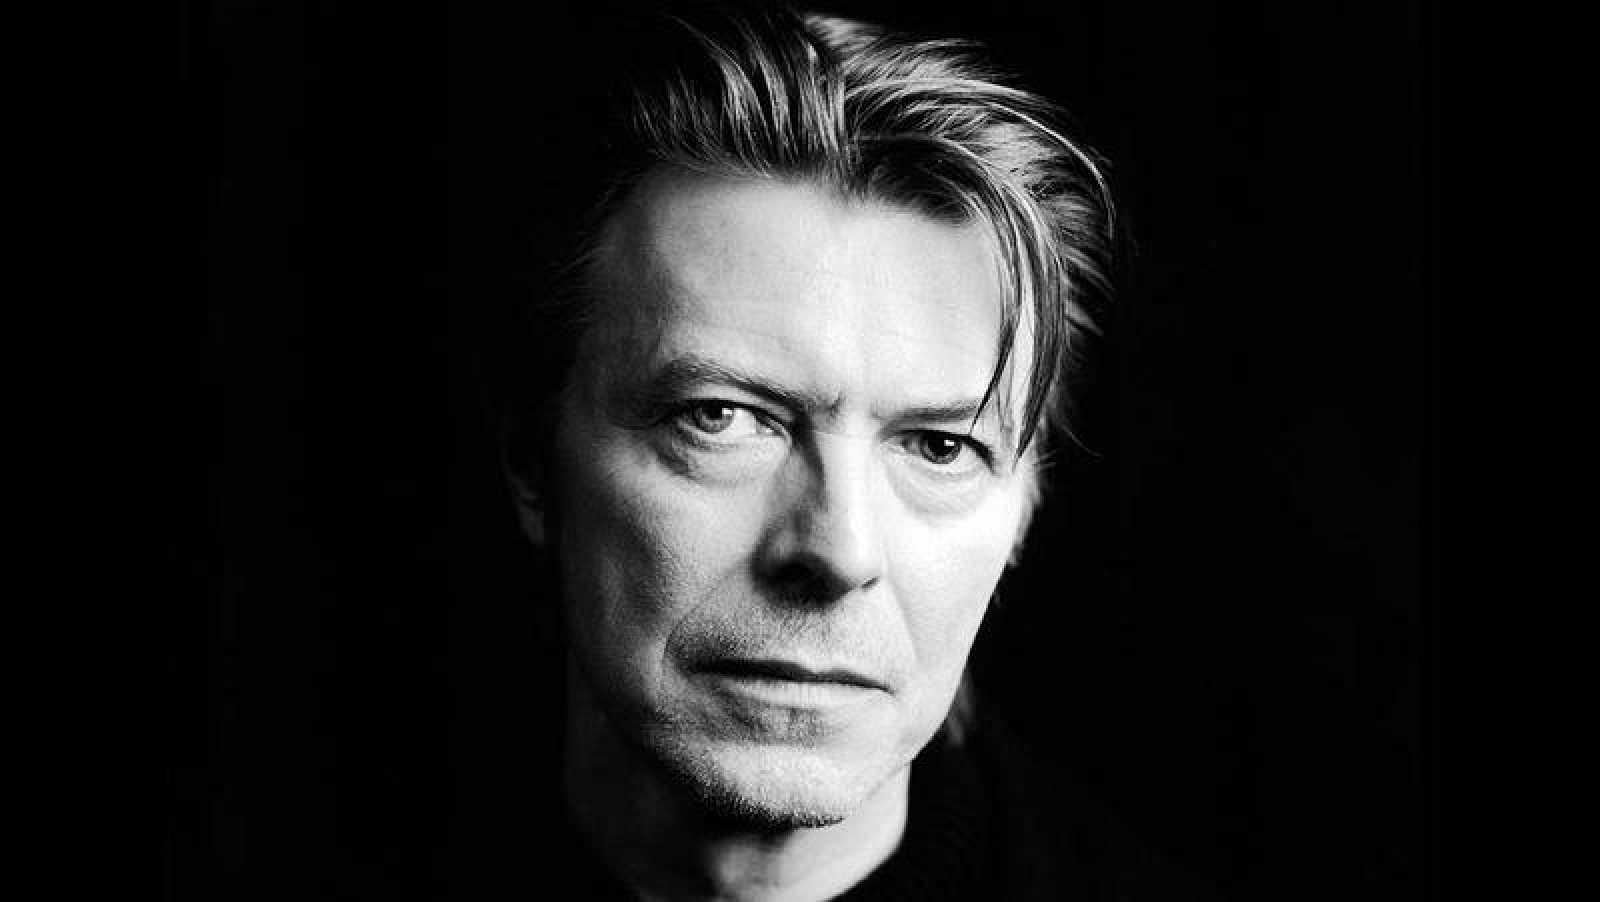 Disco Grande se suma al homenaje a David Bowie del MaF